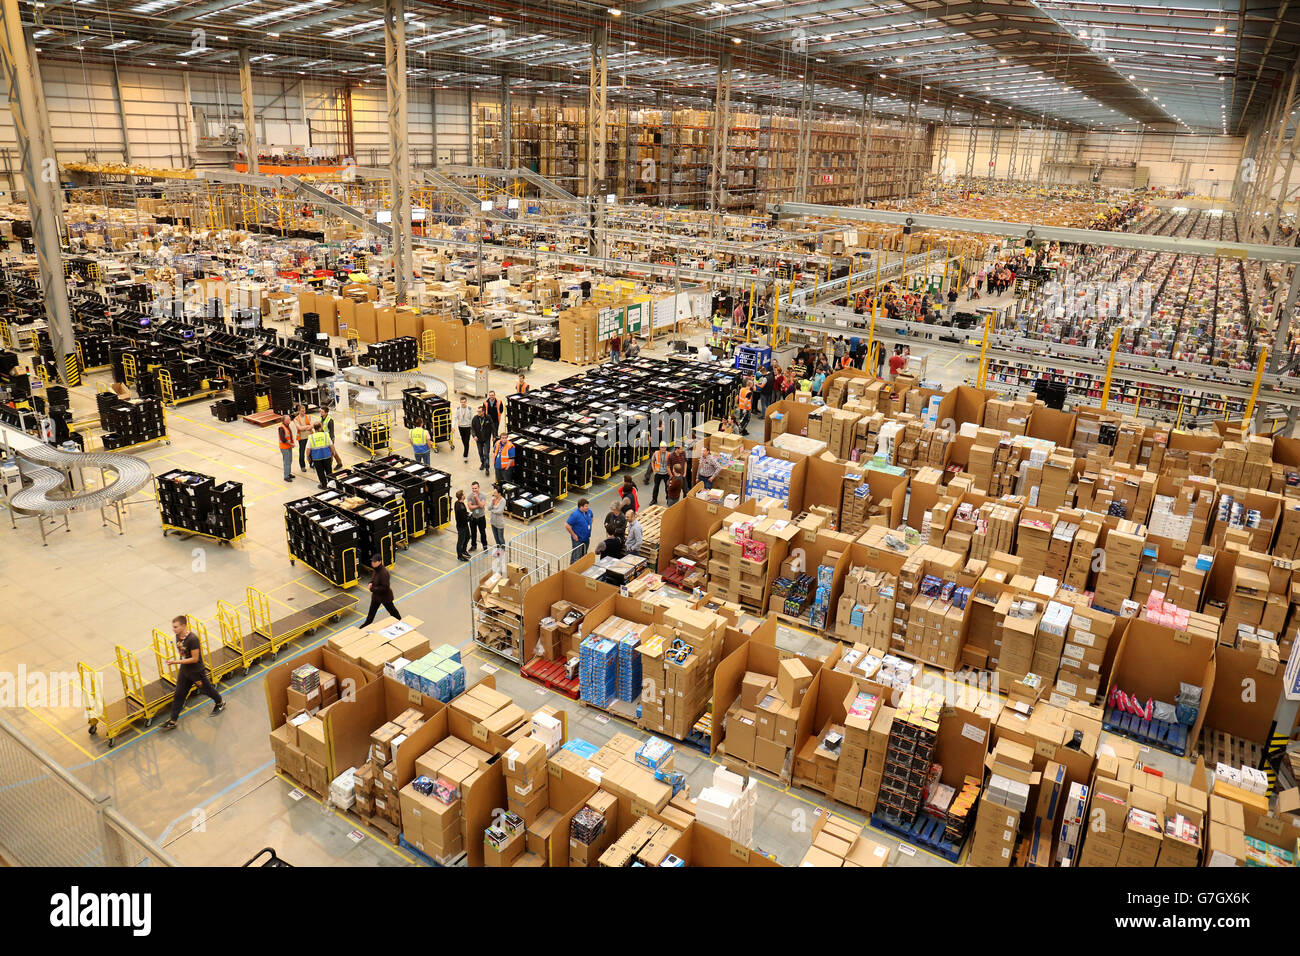 Amazon UK Fulfilment Centre - Peterborough Stock Photo